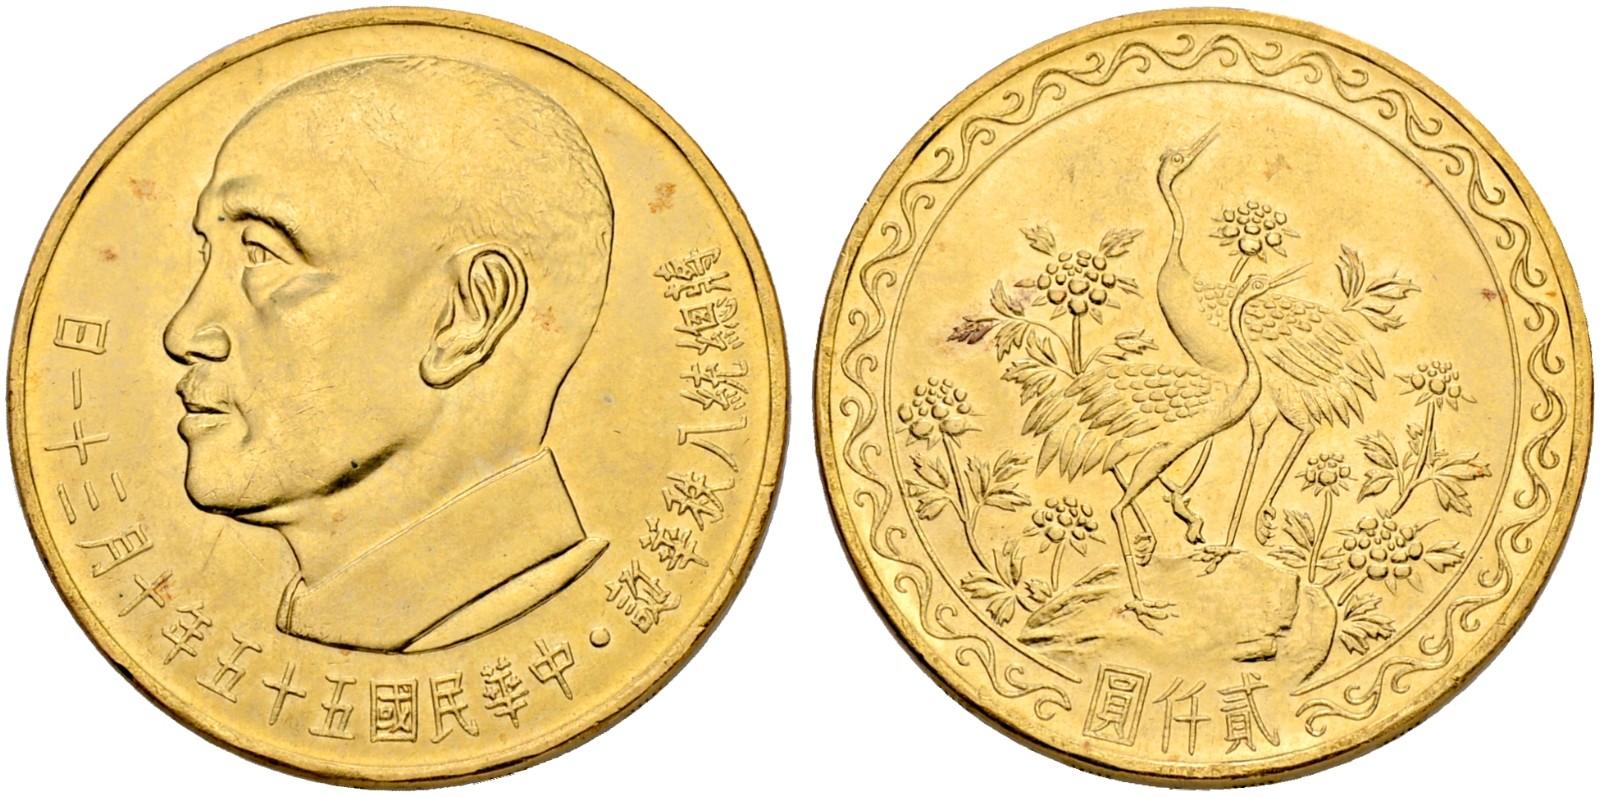 80th Birthday of Chiang Kai-shek Taiwan commemorative coin 1 yuan 1966 UNC